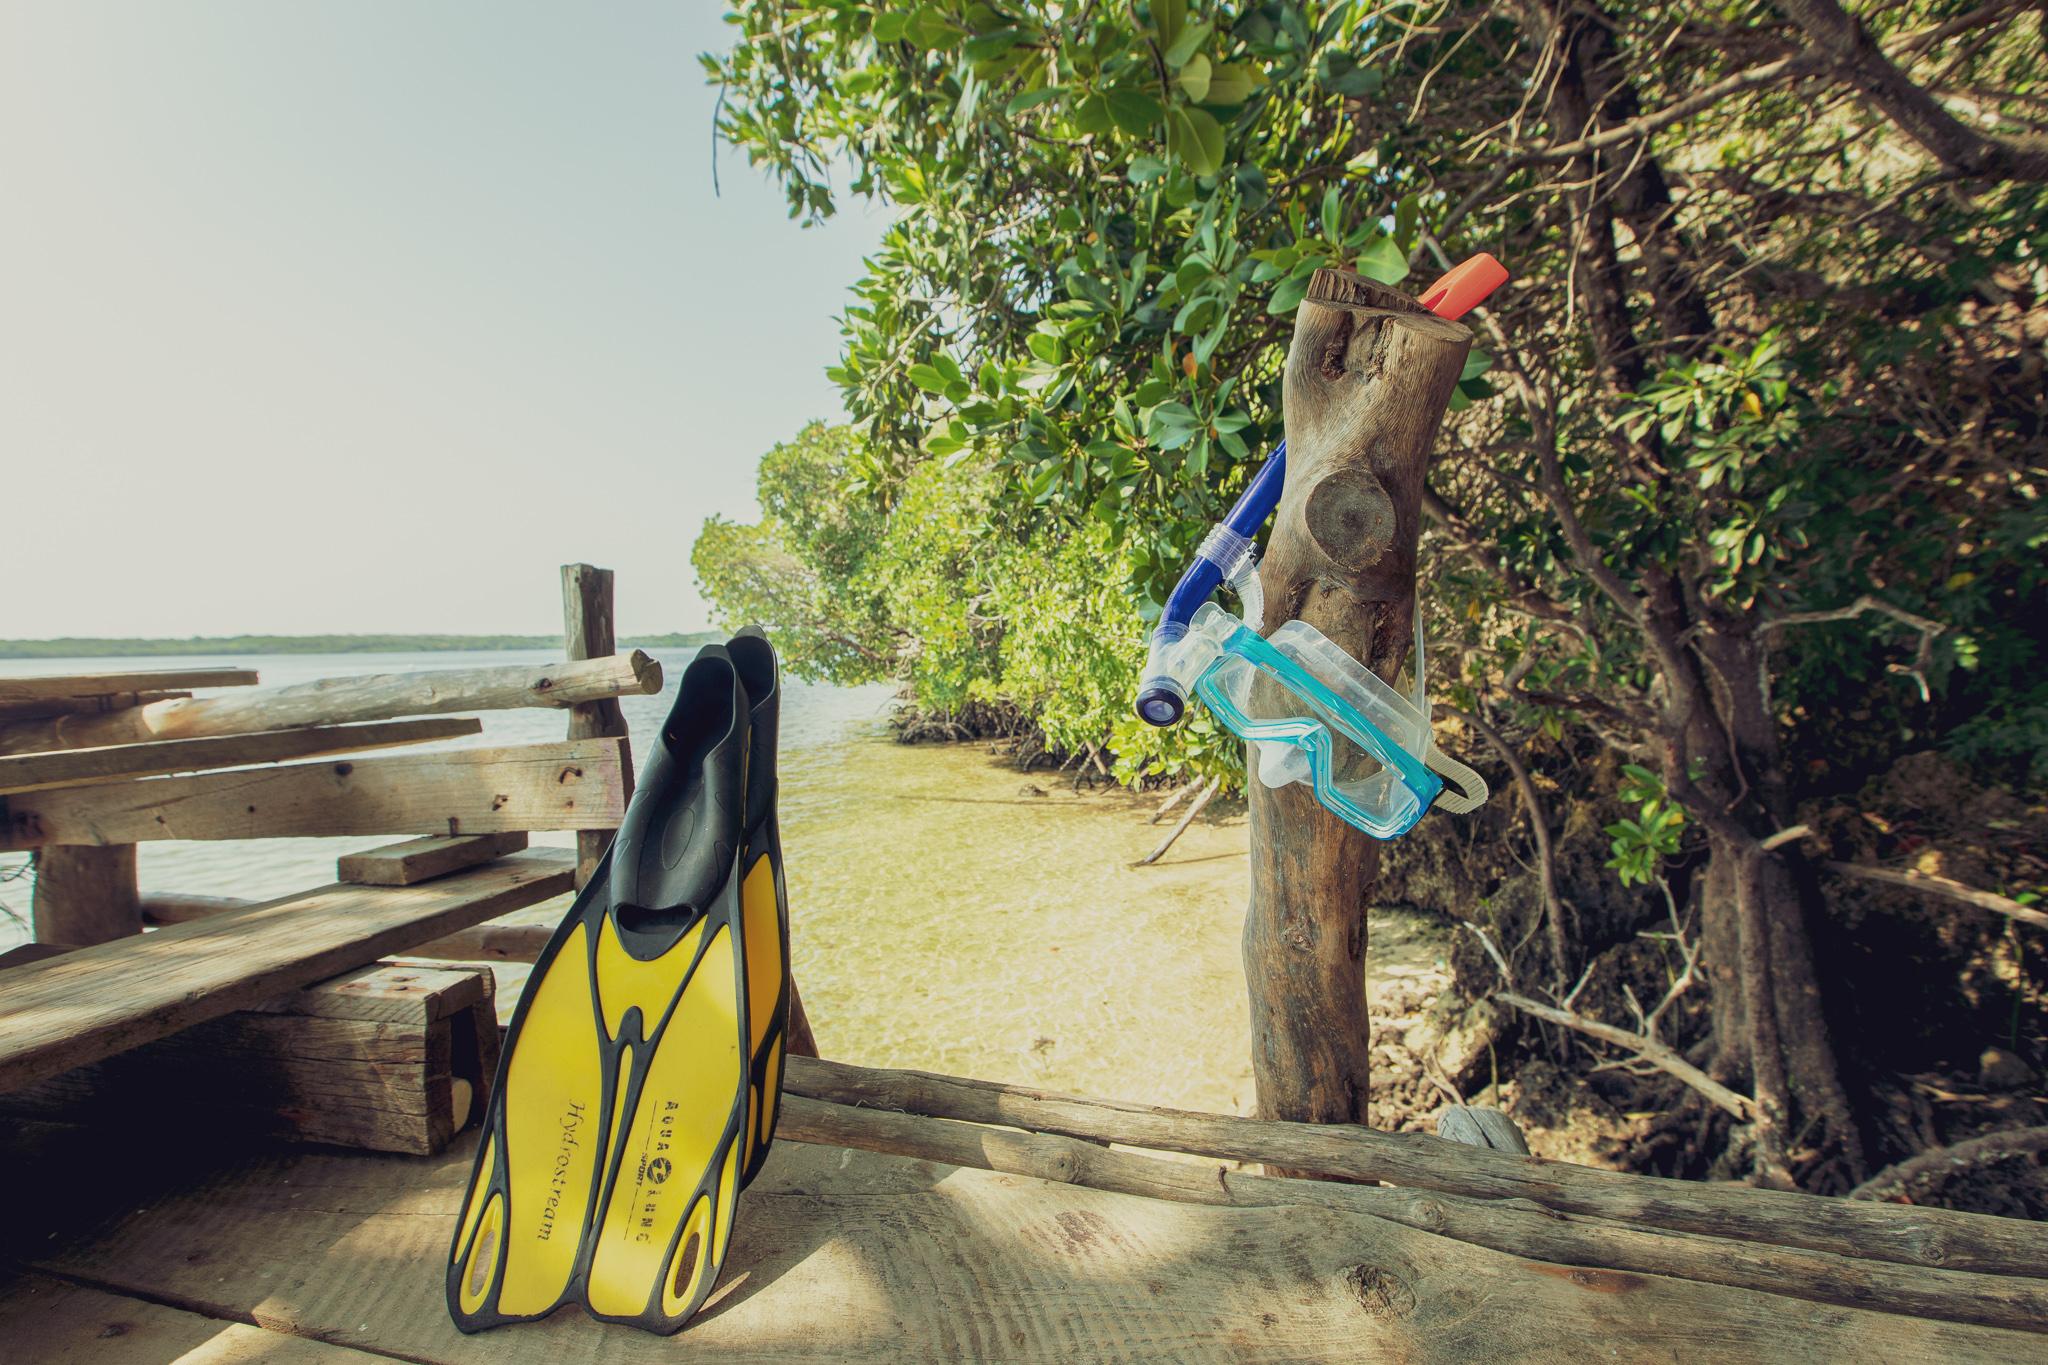 Snorkel & fins